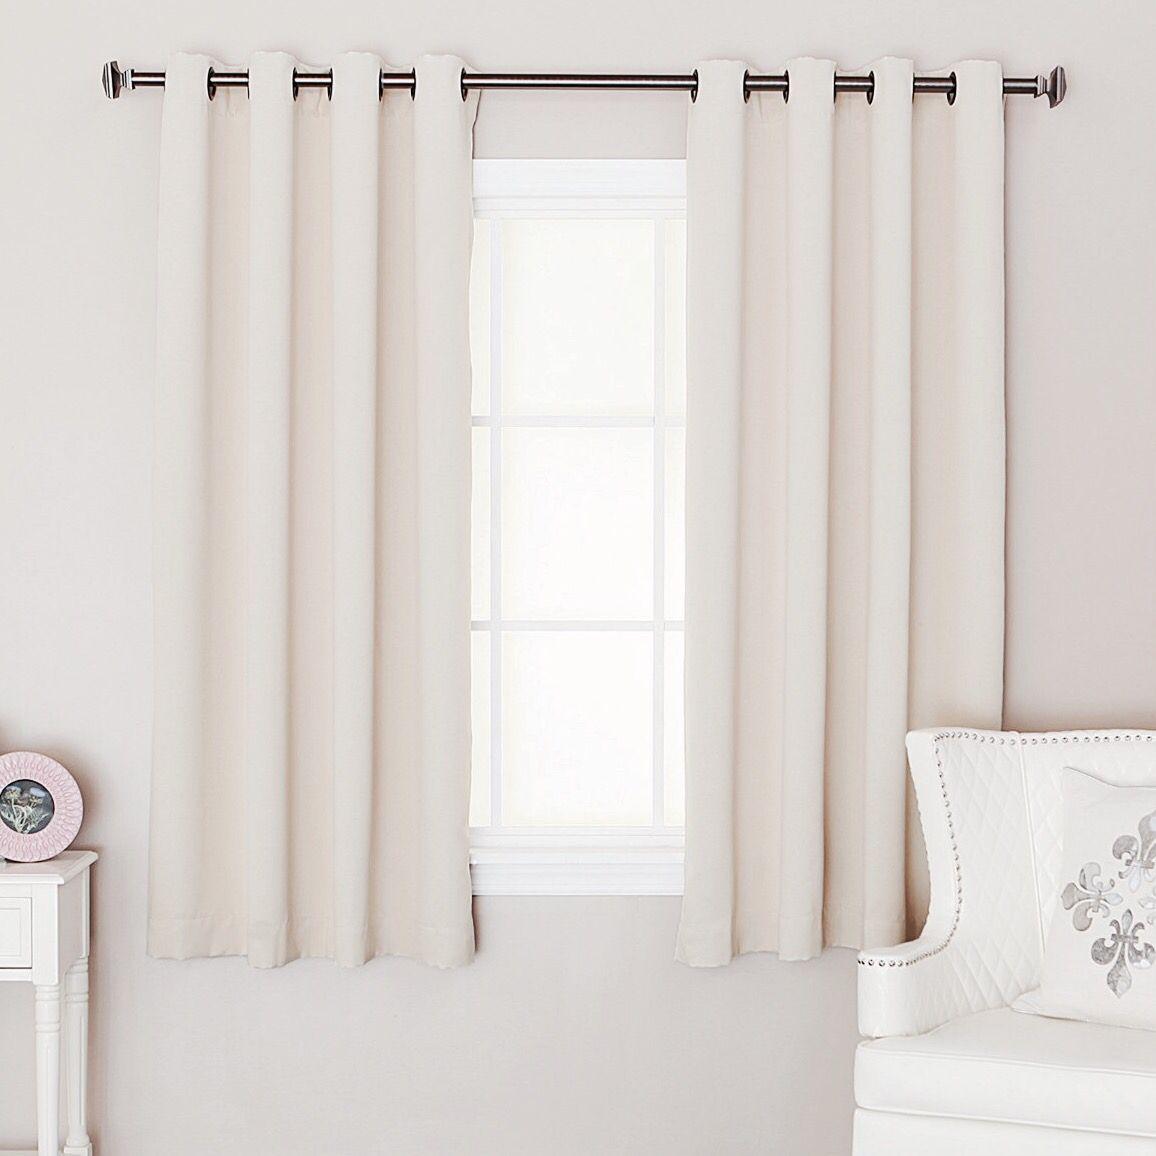 Short Curtains Square Bedroom Window Mid Century Modern Nursery Small Window Curtains